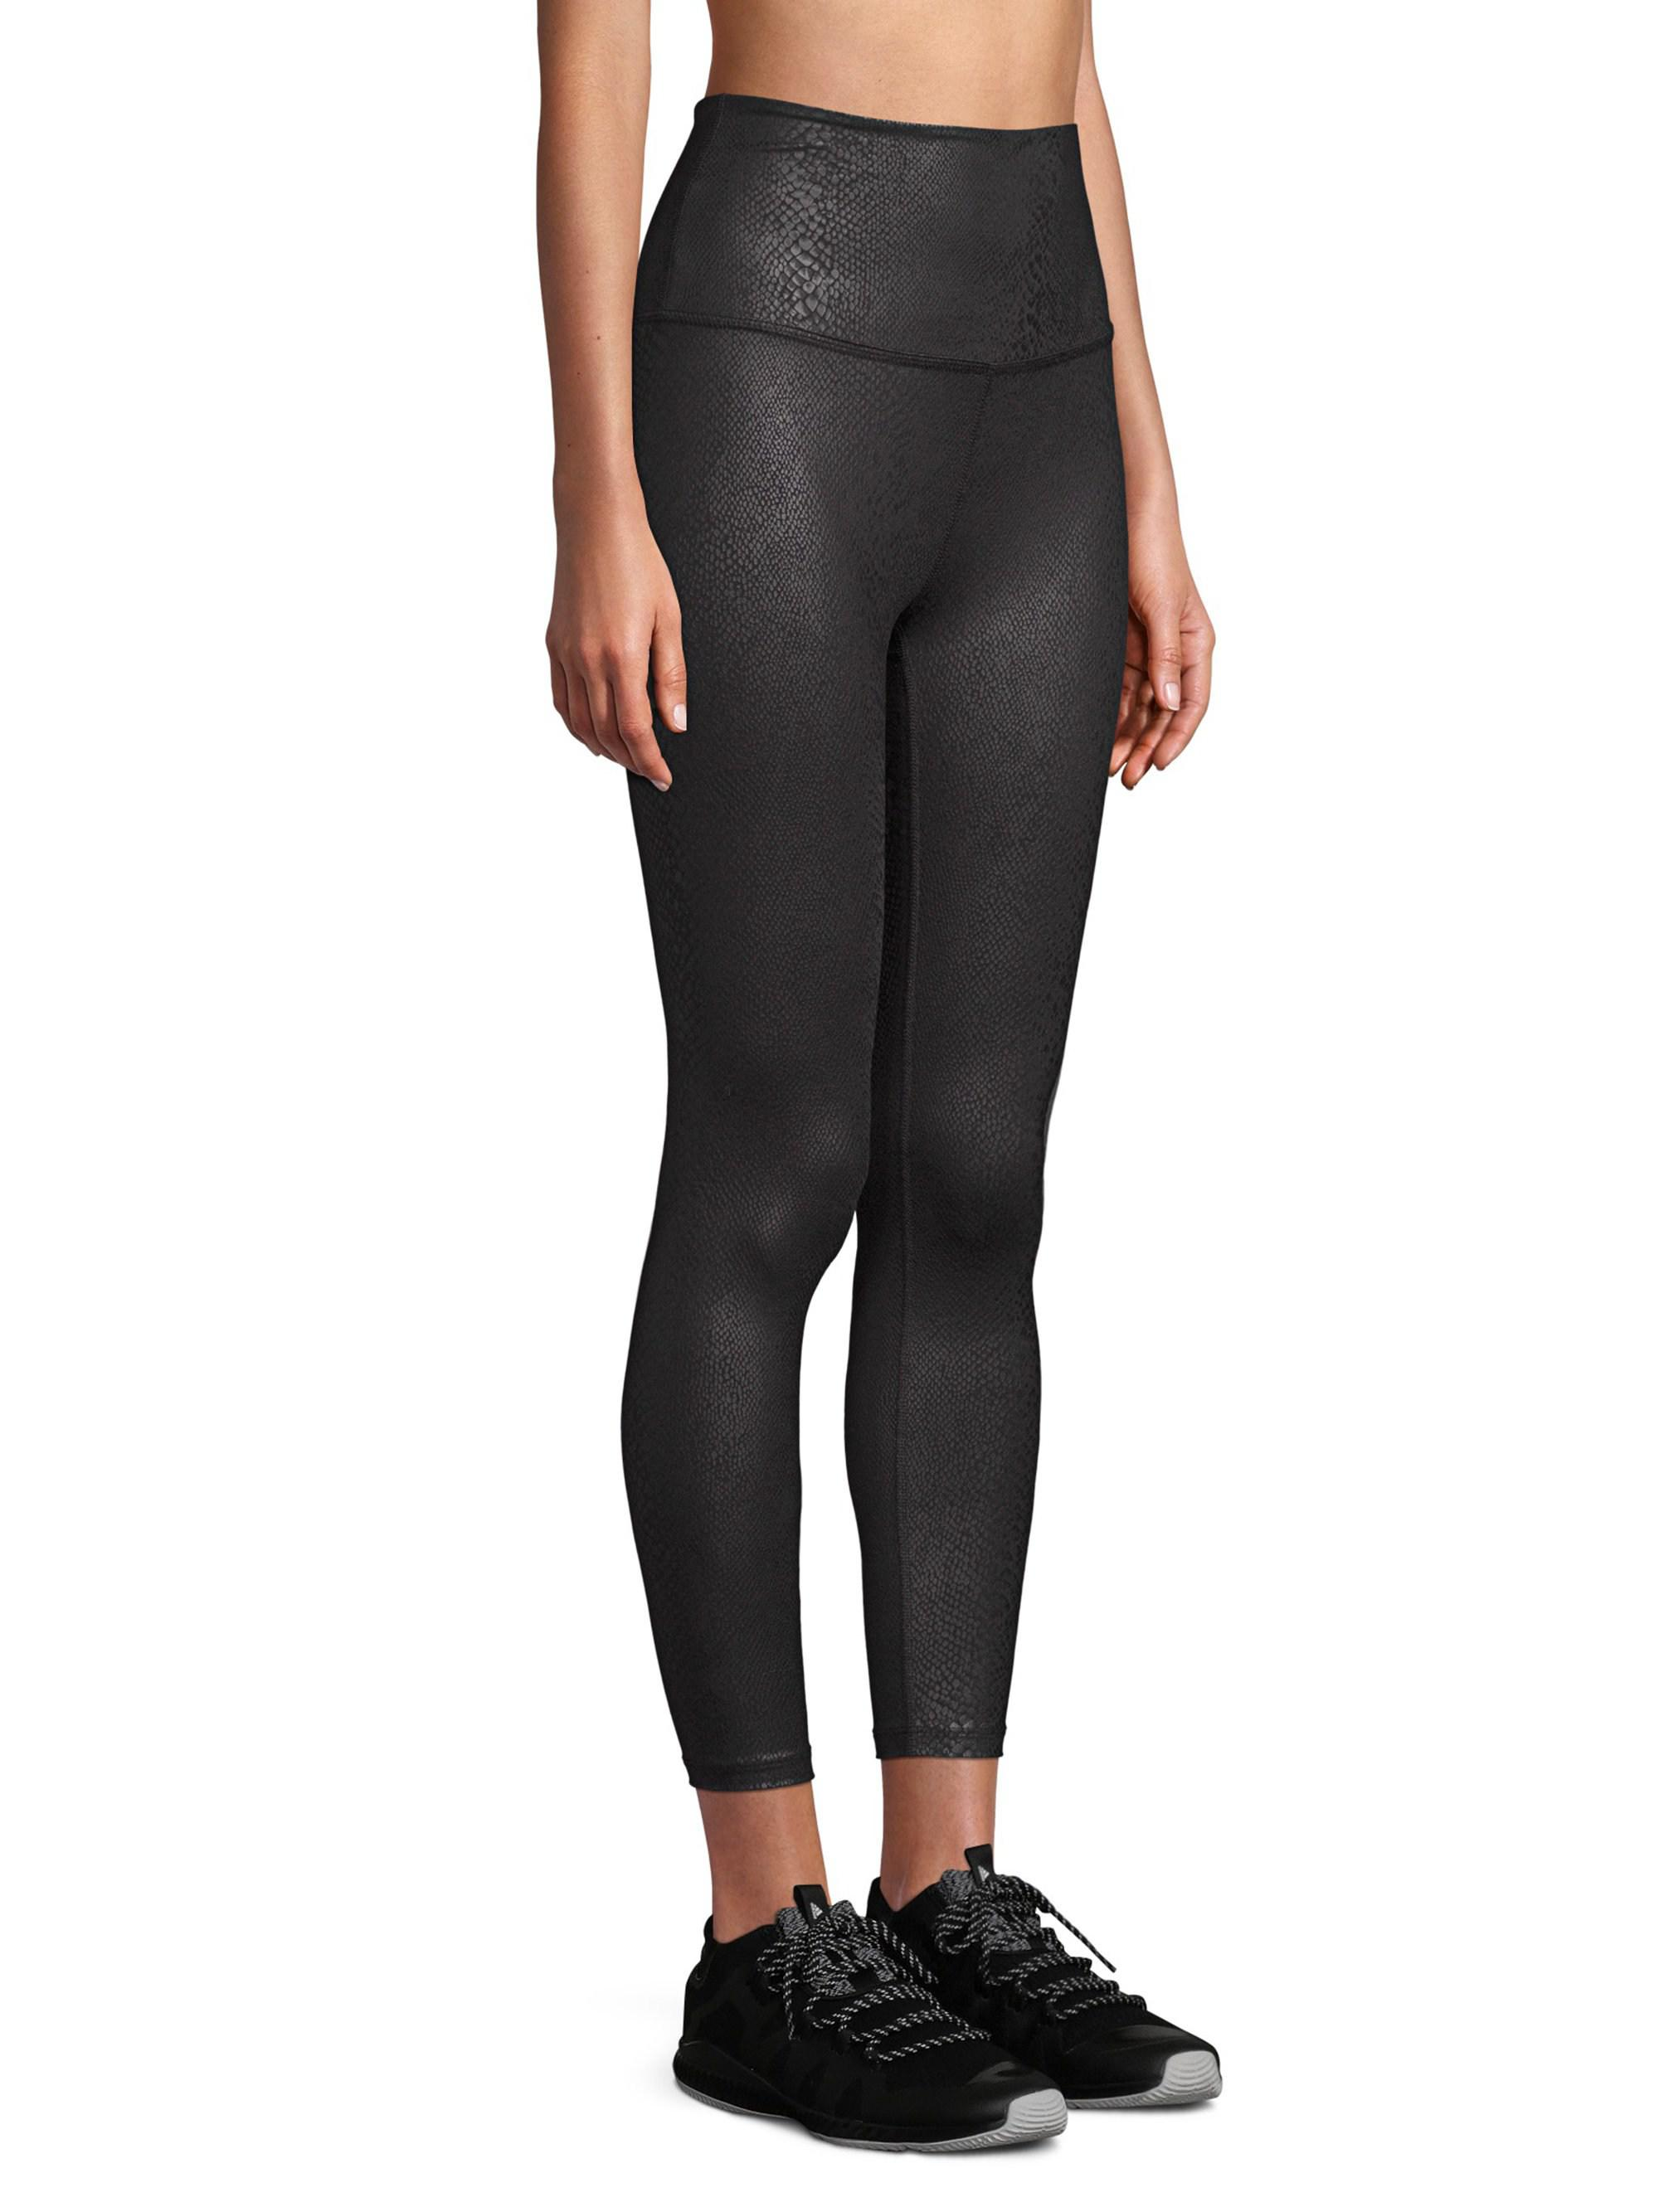 2b11ff2abdab1 Beyond Yoga Viper High-waisted Midi Leggings in Black - Lyst